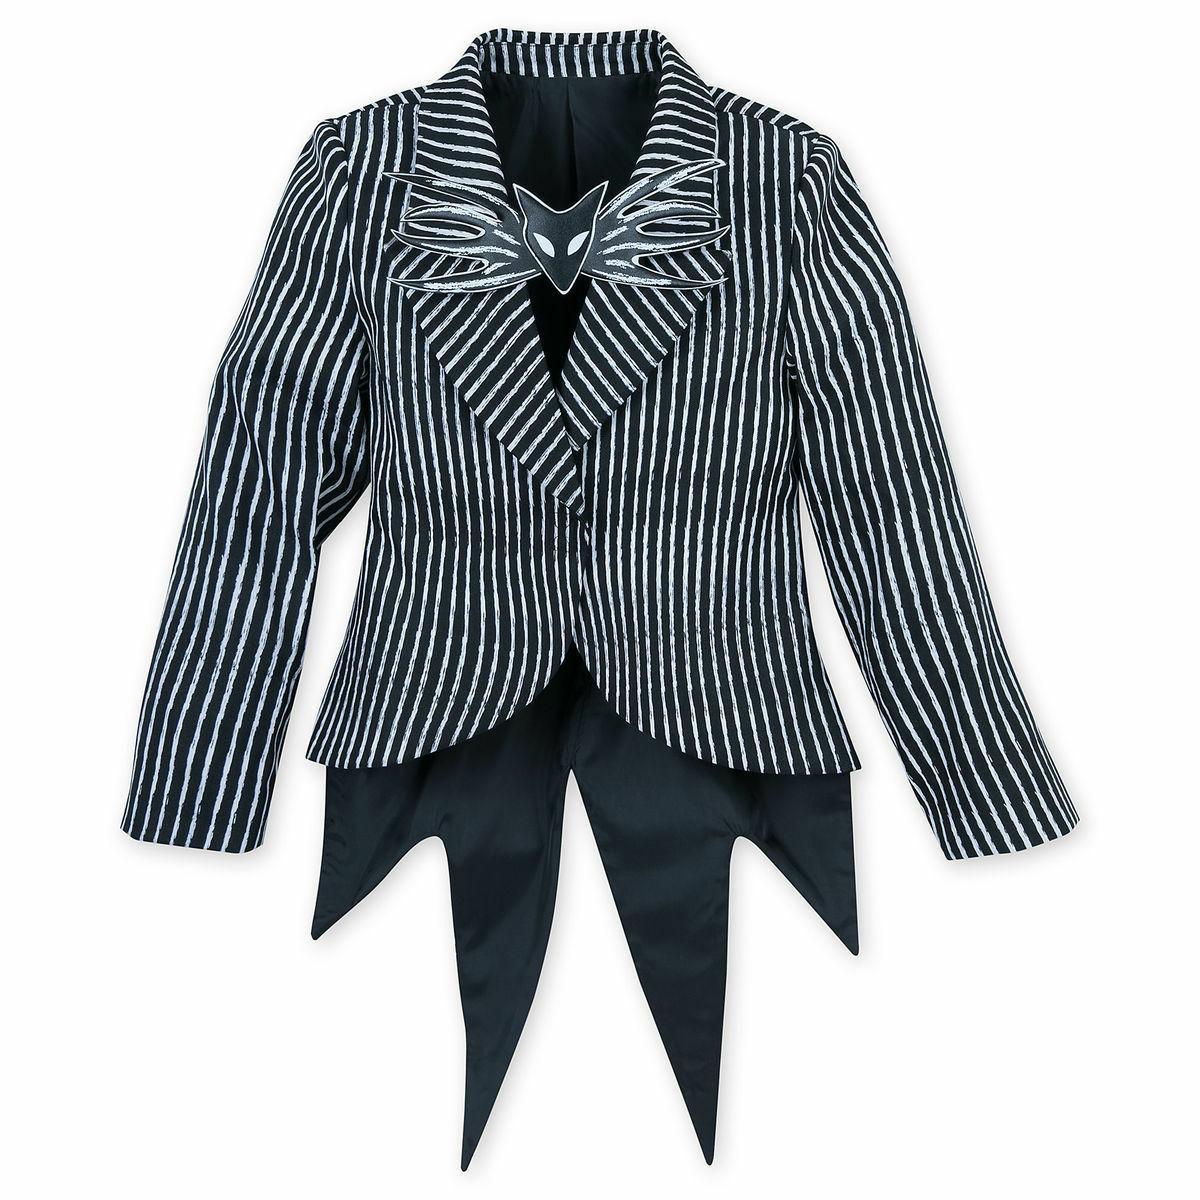 new child jack skellington costume jacket